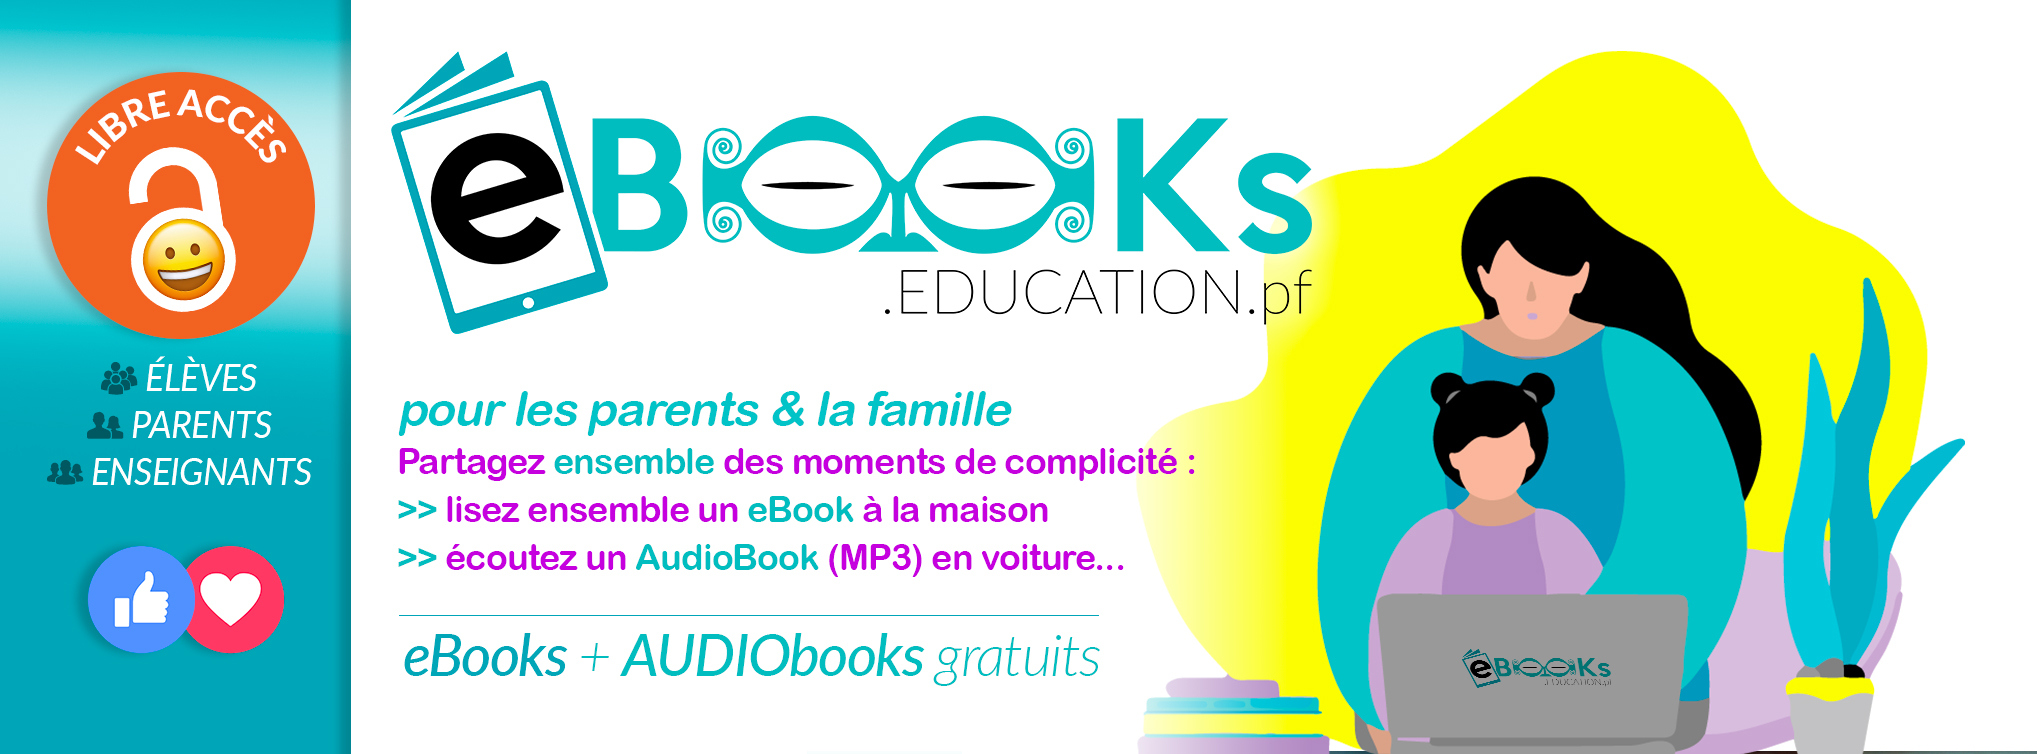 cover3-ebookseducation